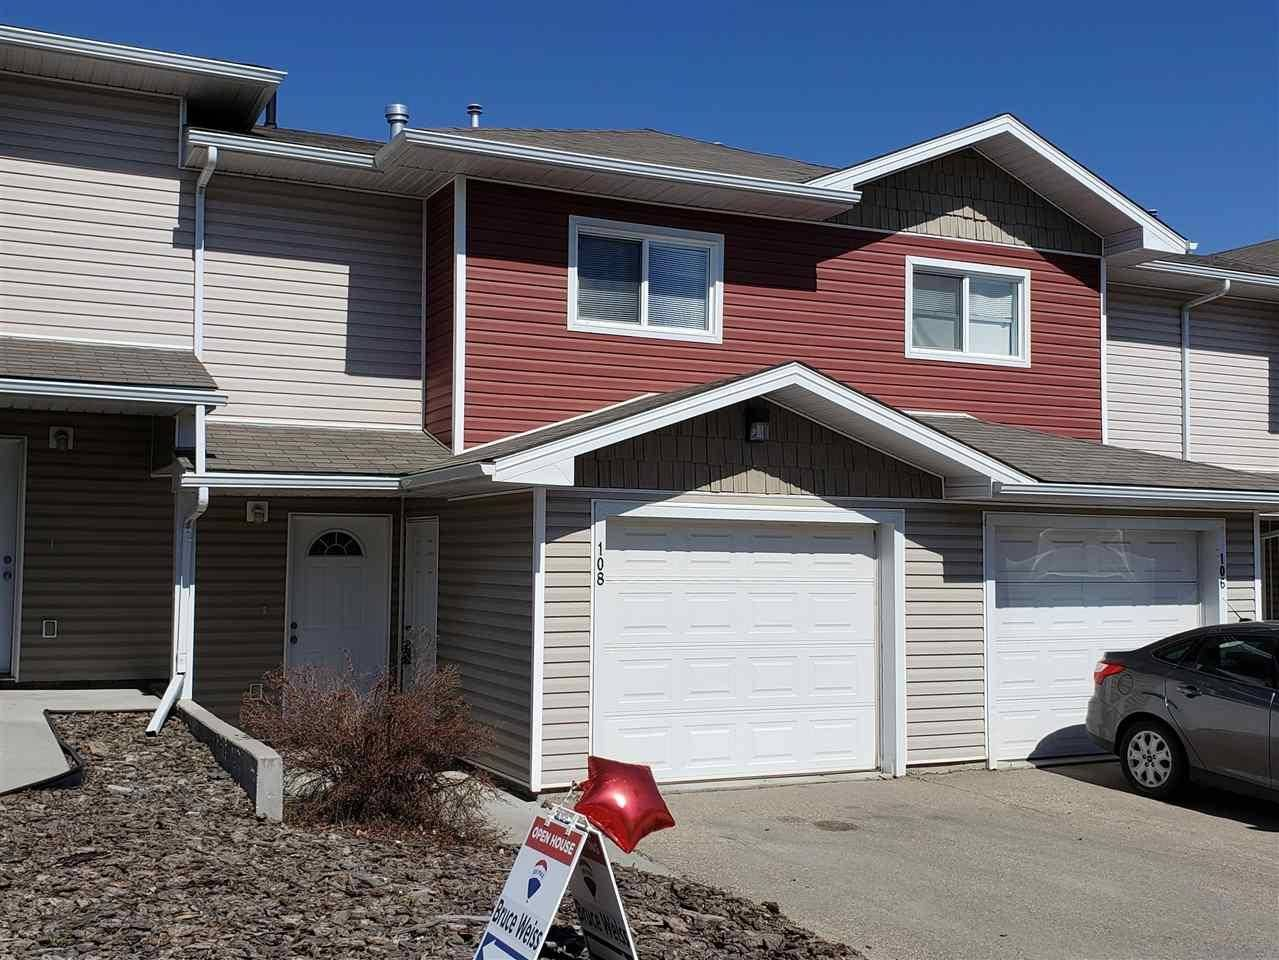 Townhouse for sale at 166 Bridgeport Blvd Unit 108 Leduc Alberta - MLS: E4158539